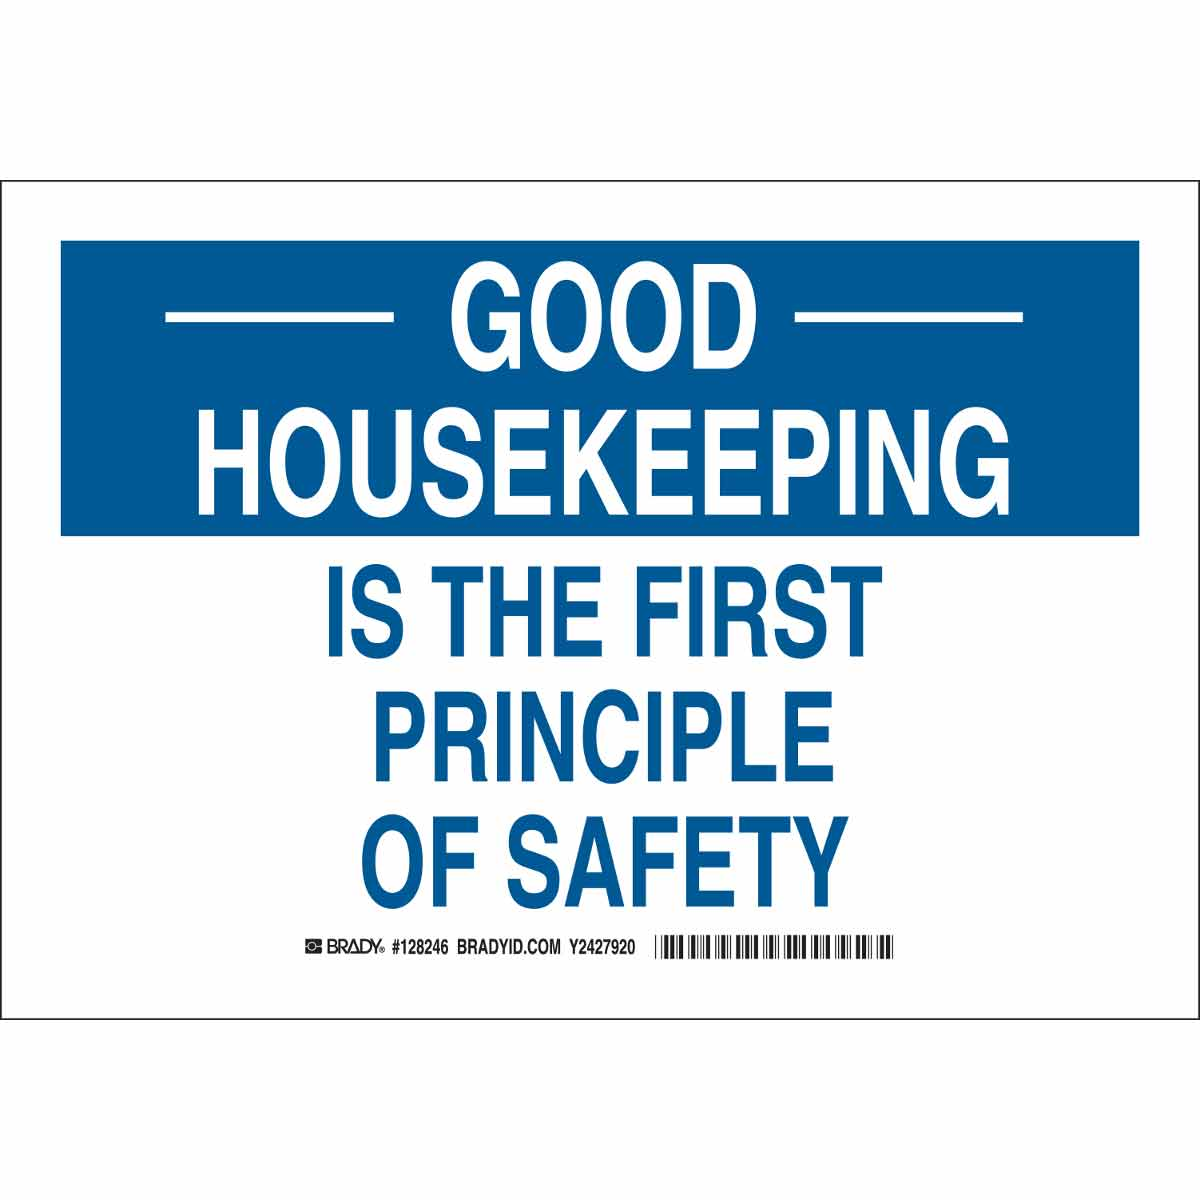 Good Housekeeping: GOOD HOUSEKEEPING Is The First